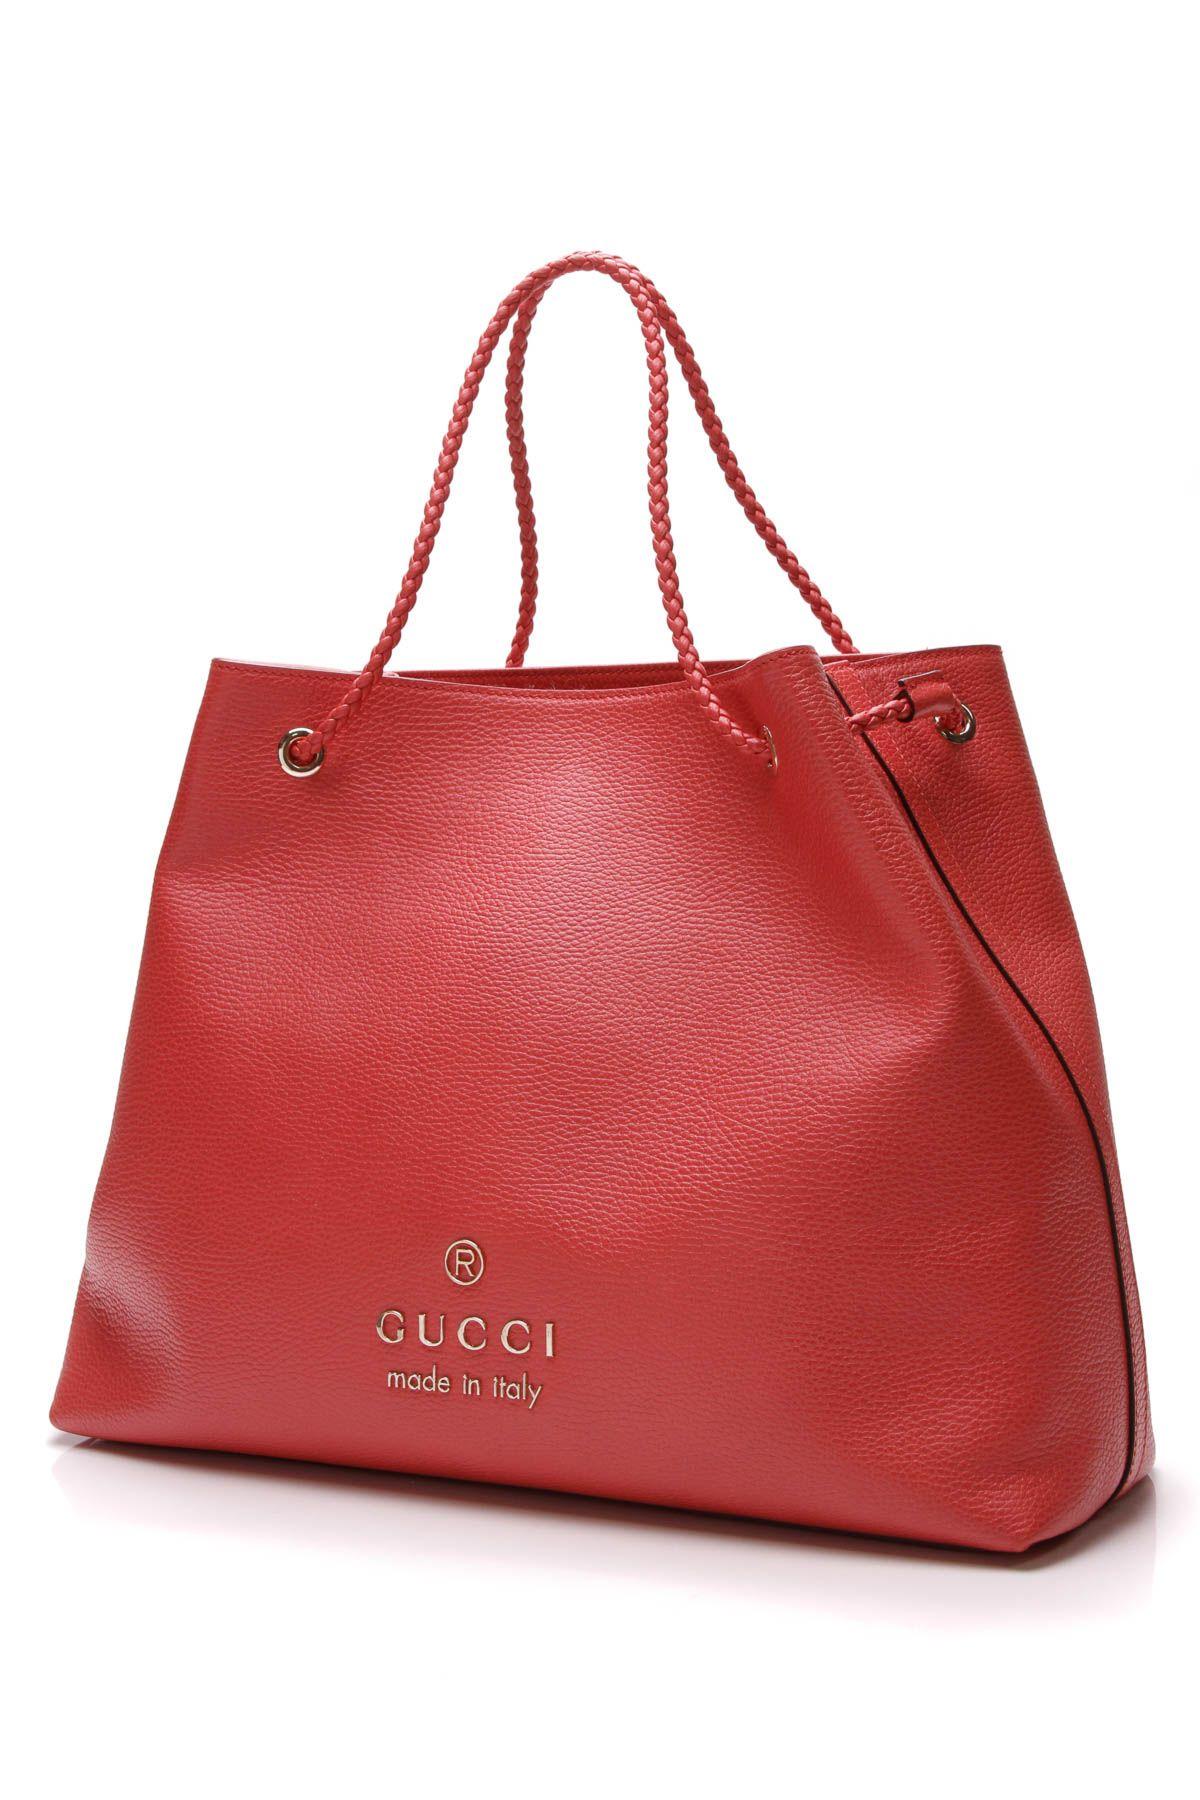 ebf855109510 Gucci Gifford Braided Large Coral Tote Bag   Gucci Glam   Bags ...